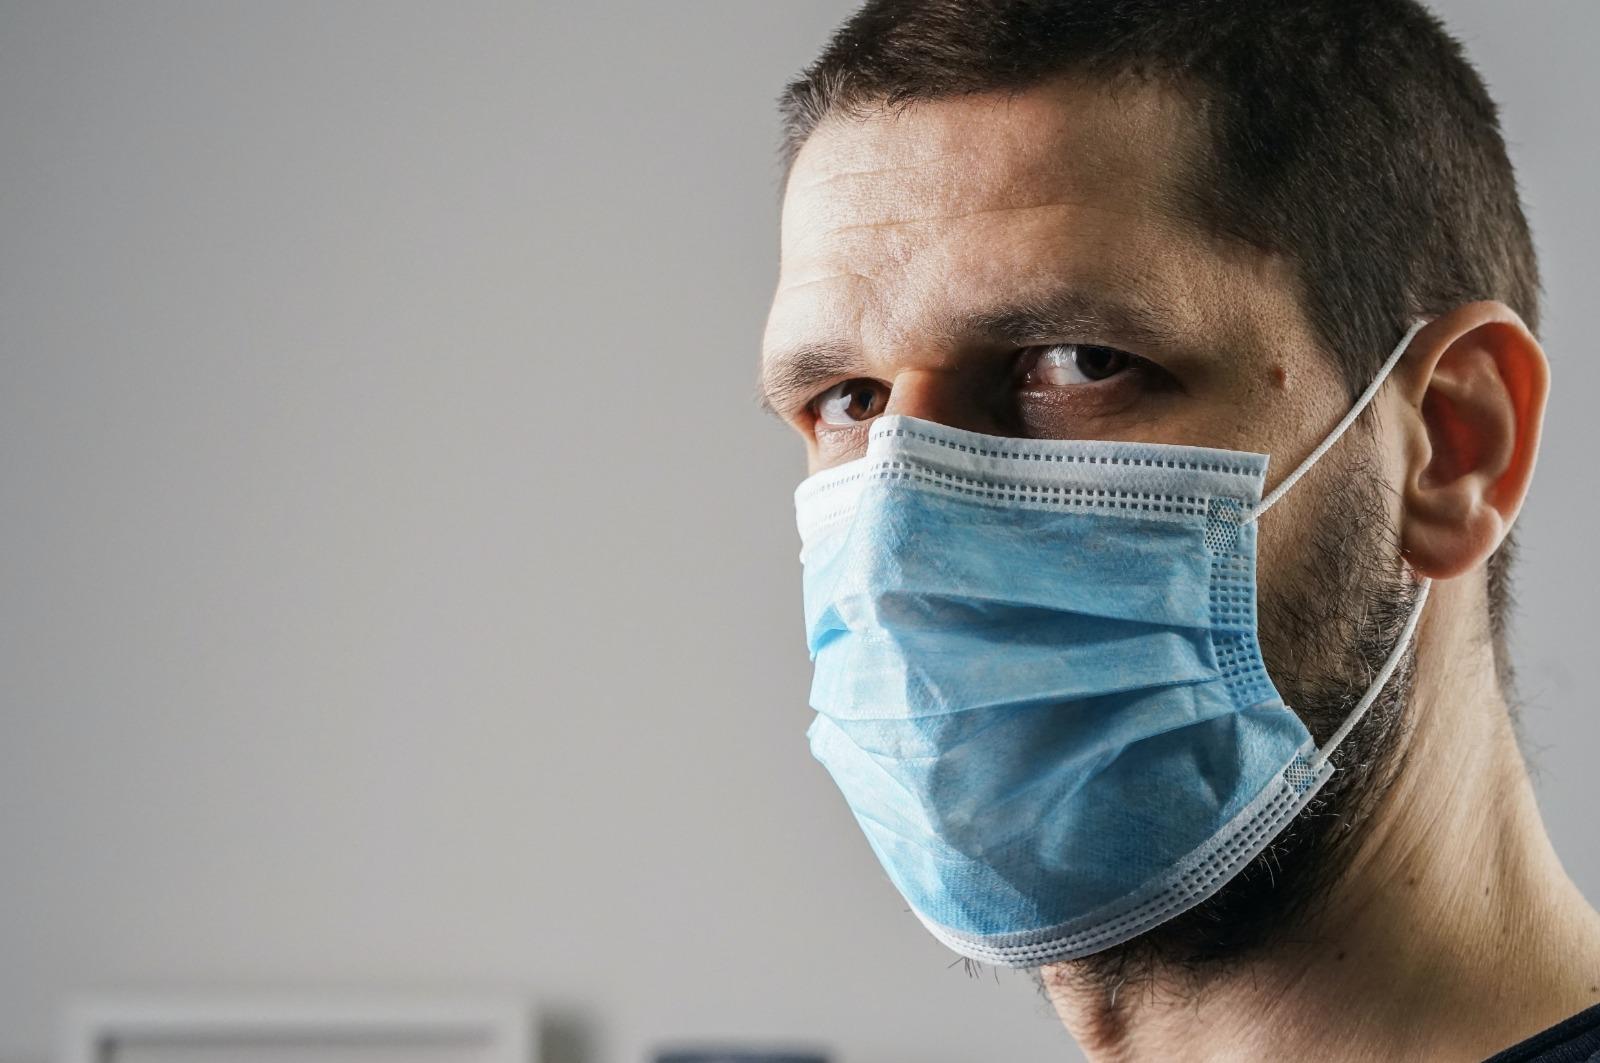 The New Normal and the Post-Coronavirus Self